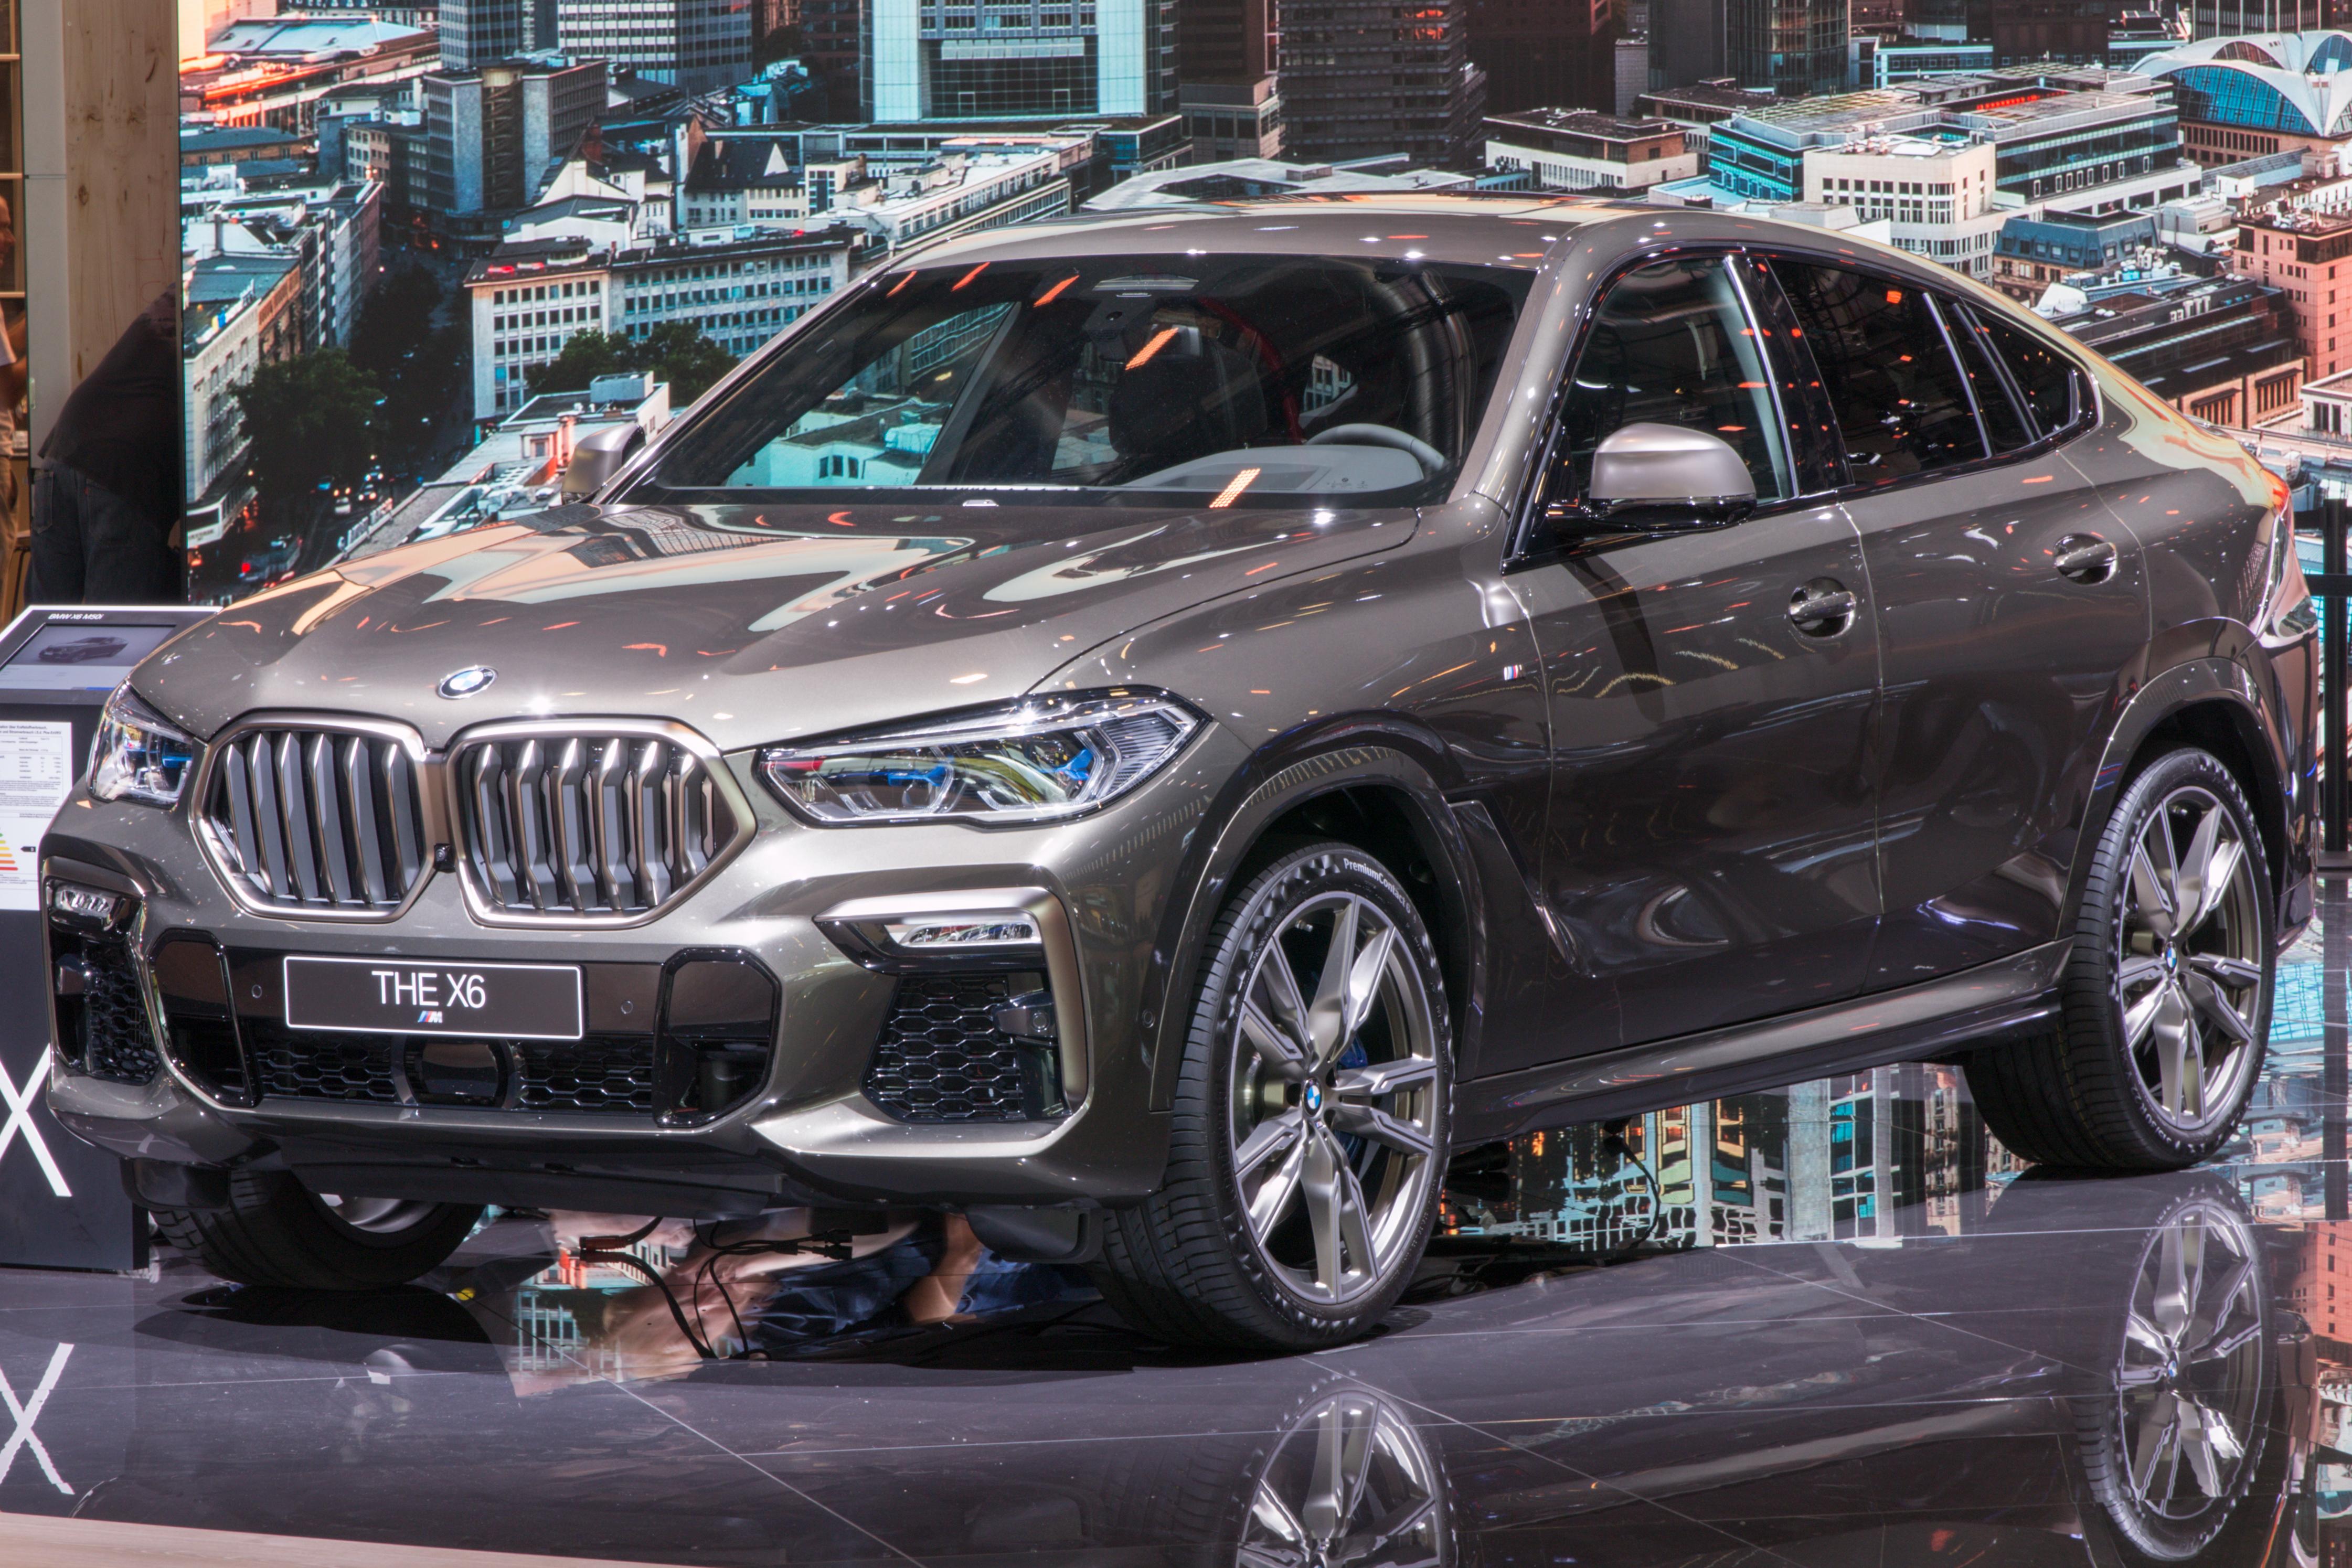 later meet amazon BMW X6 (G06) - Wikipedia